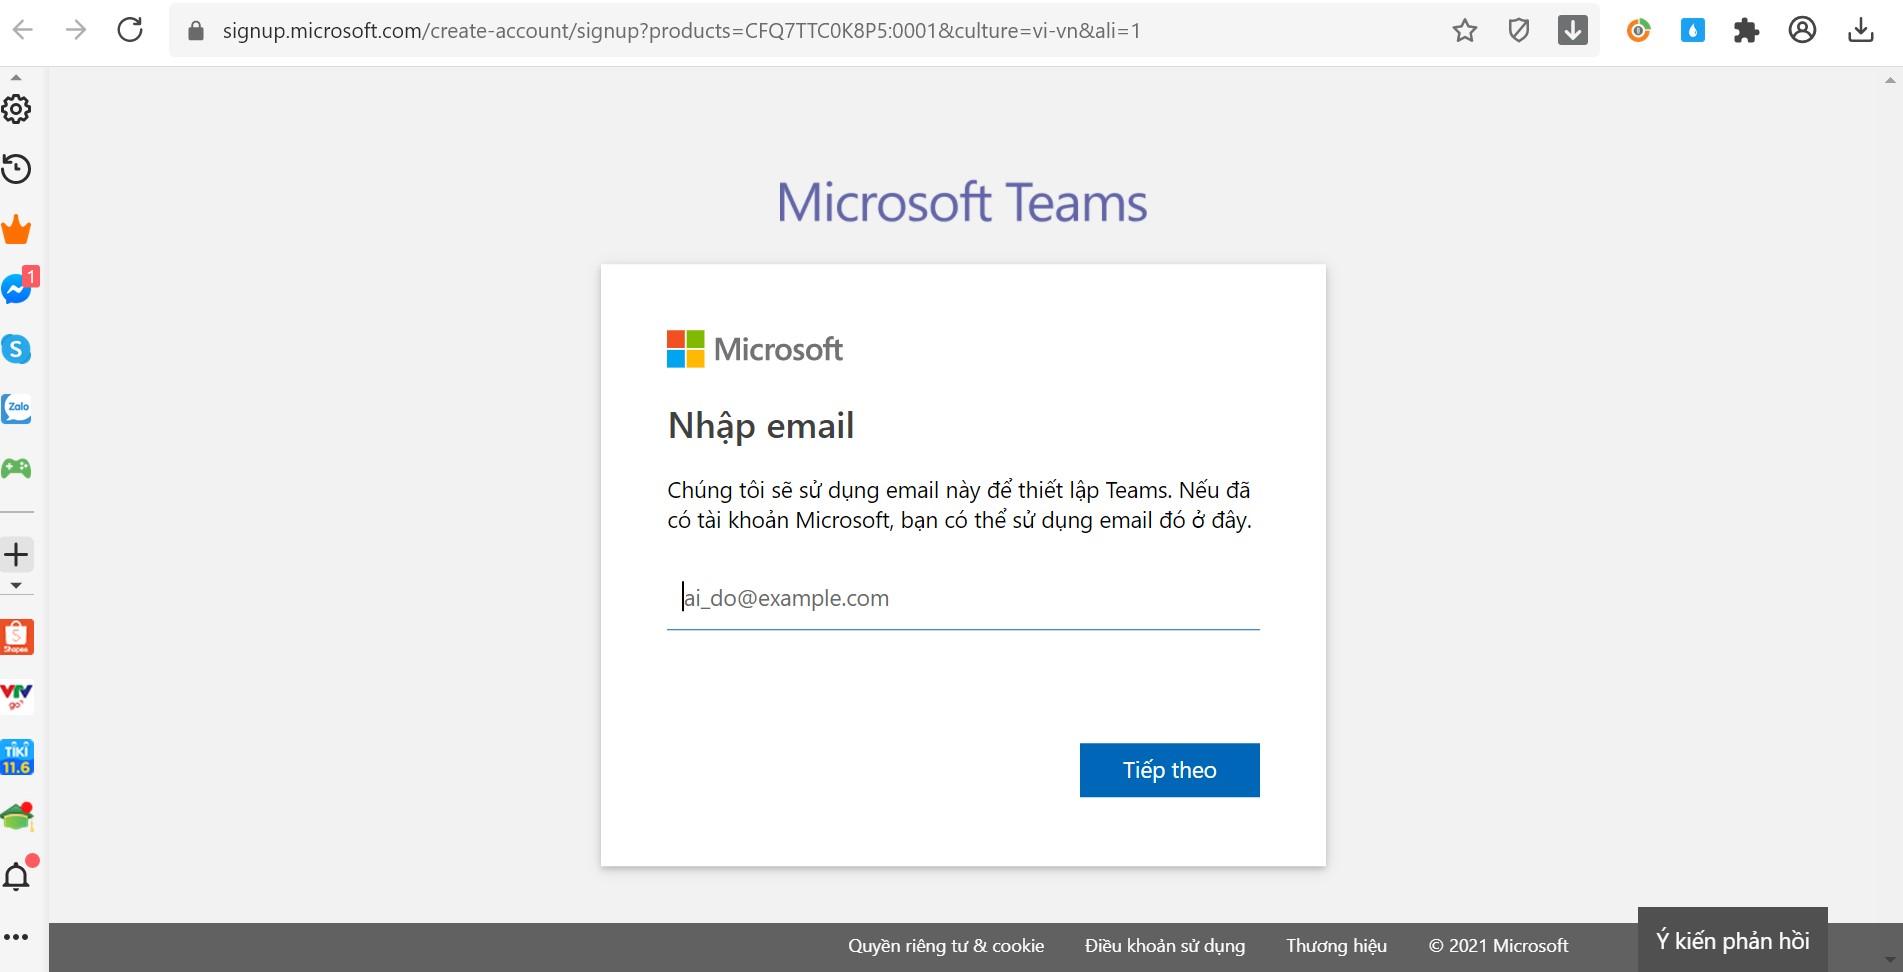 Đăng kí Microsoft Teams